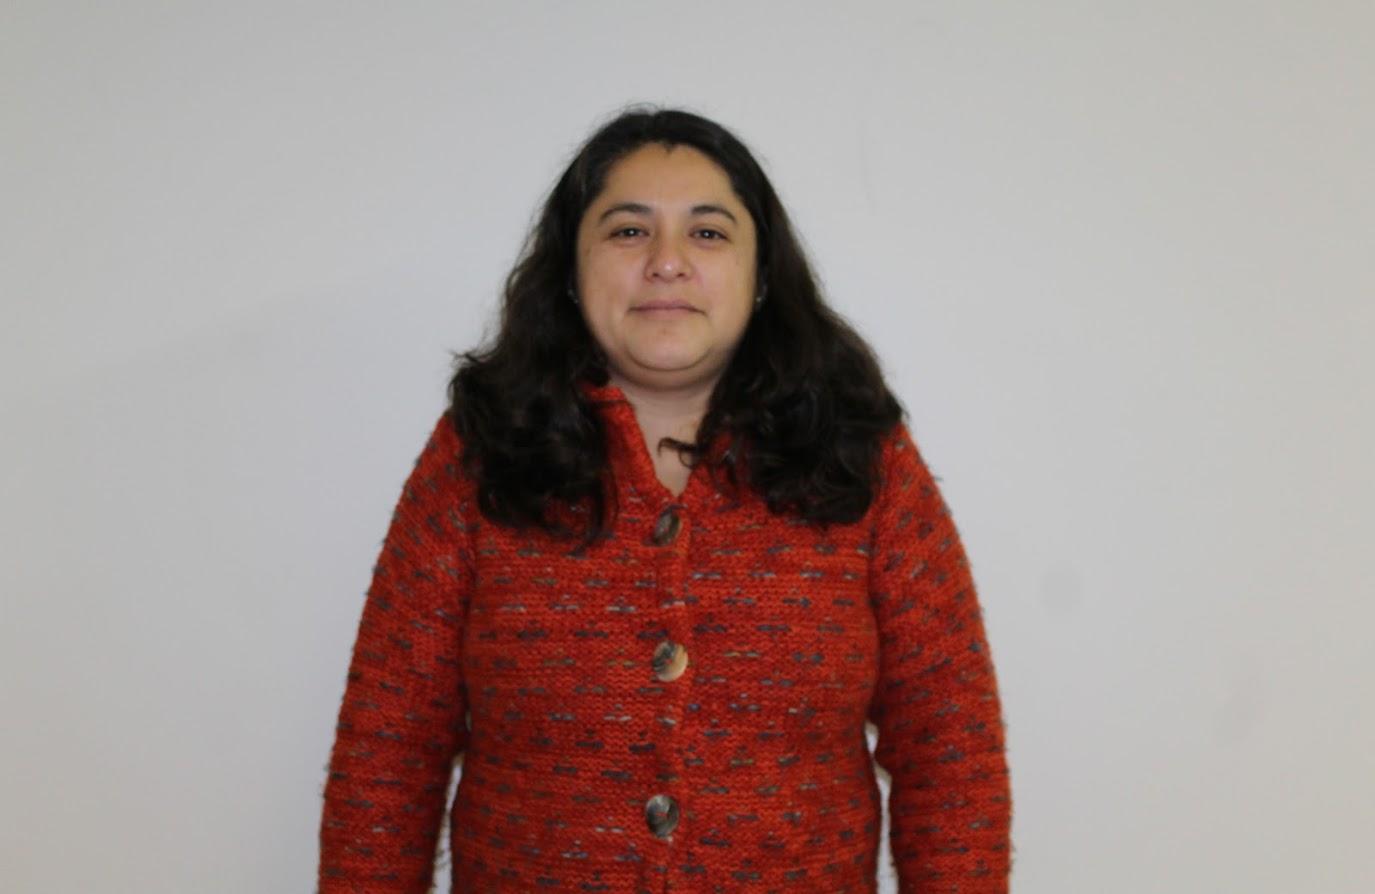 Karla Altamirano Manel